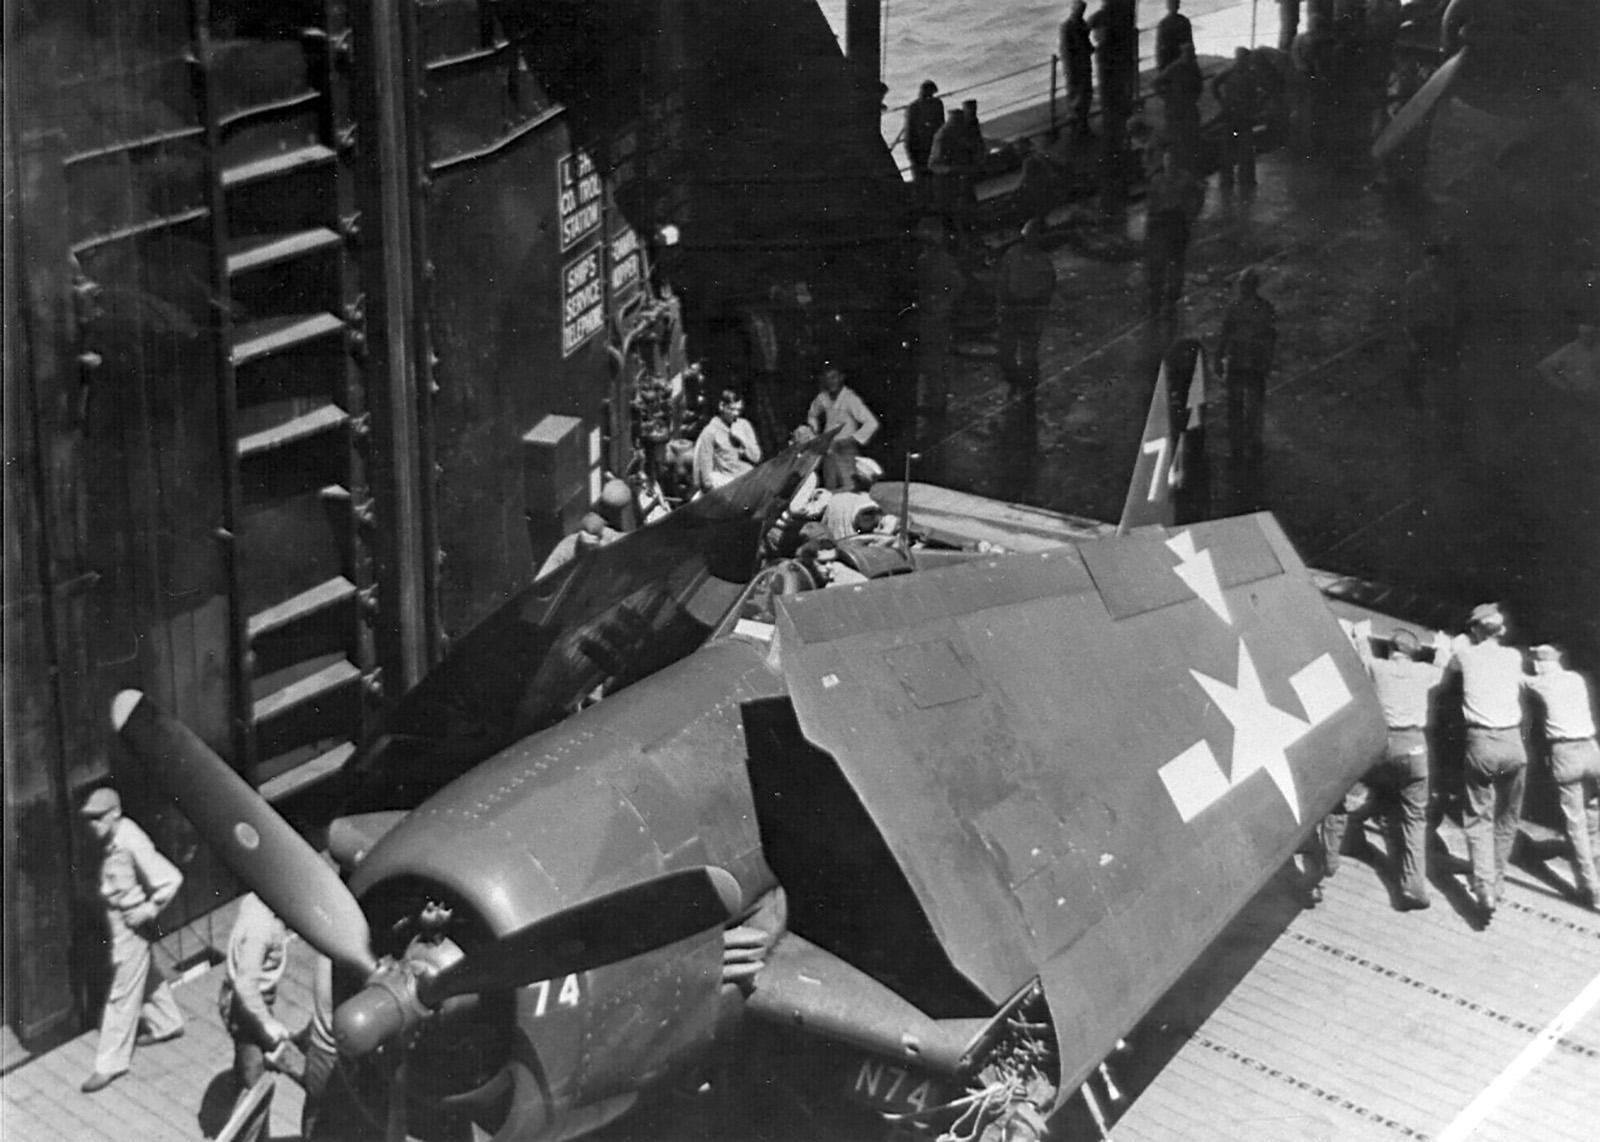 Grumman F6F 5 Hellcat VF 82 White 74 aboard CV 20 USS Bennington 1944 01